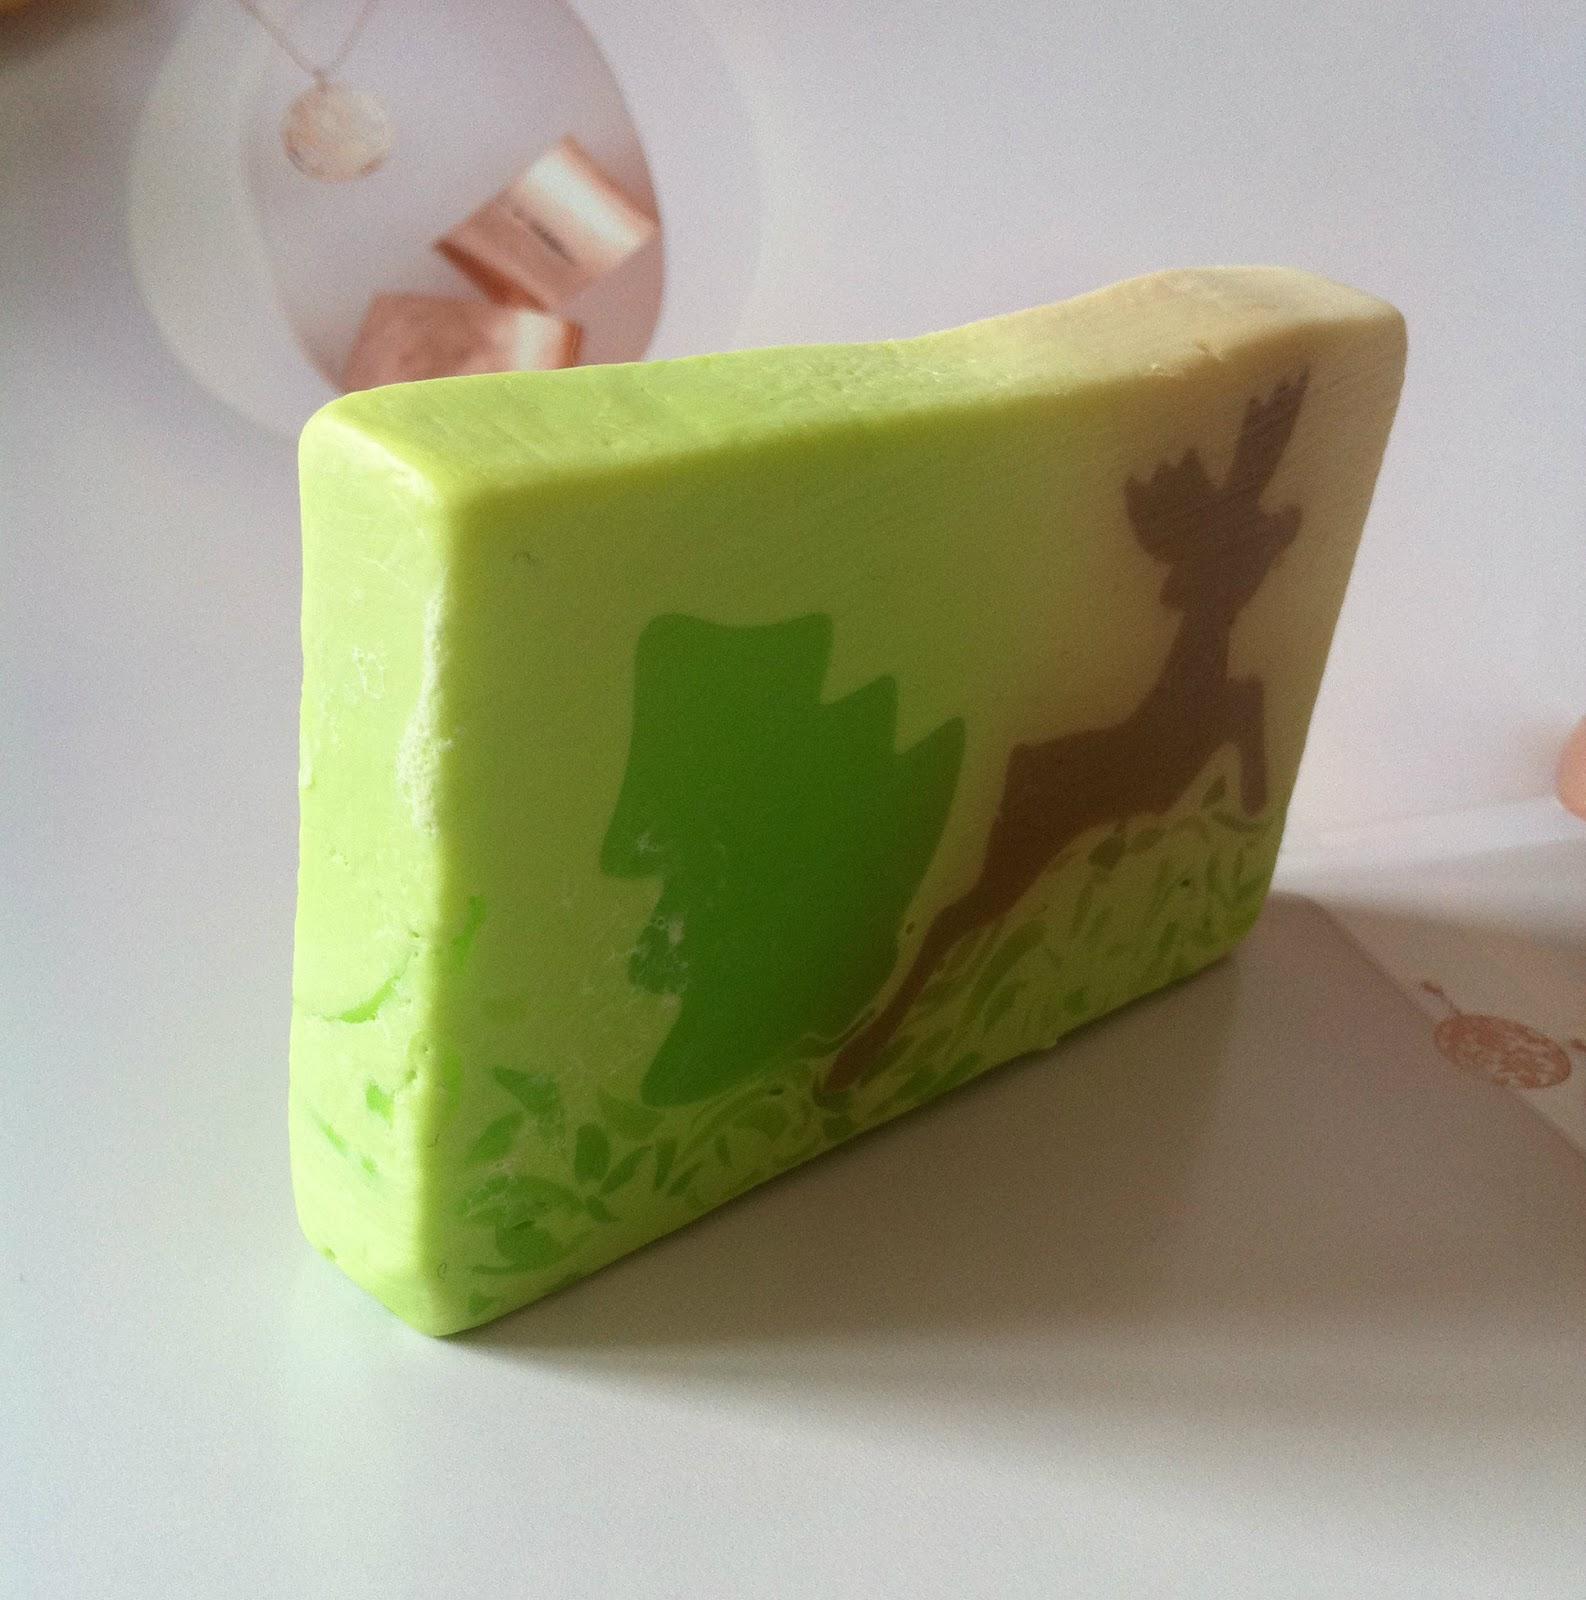 Mydło organiczne z naturalnymi ekstraktami Zielona Herbata i Bambus od Tso Moriri